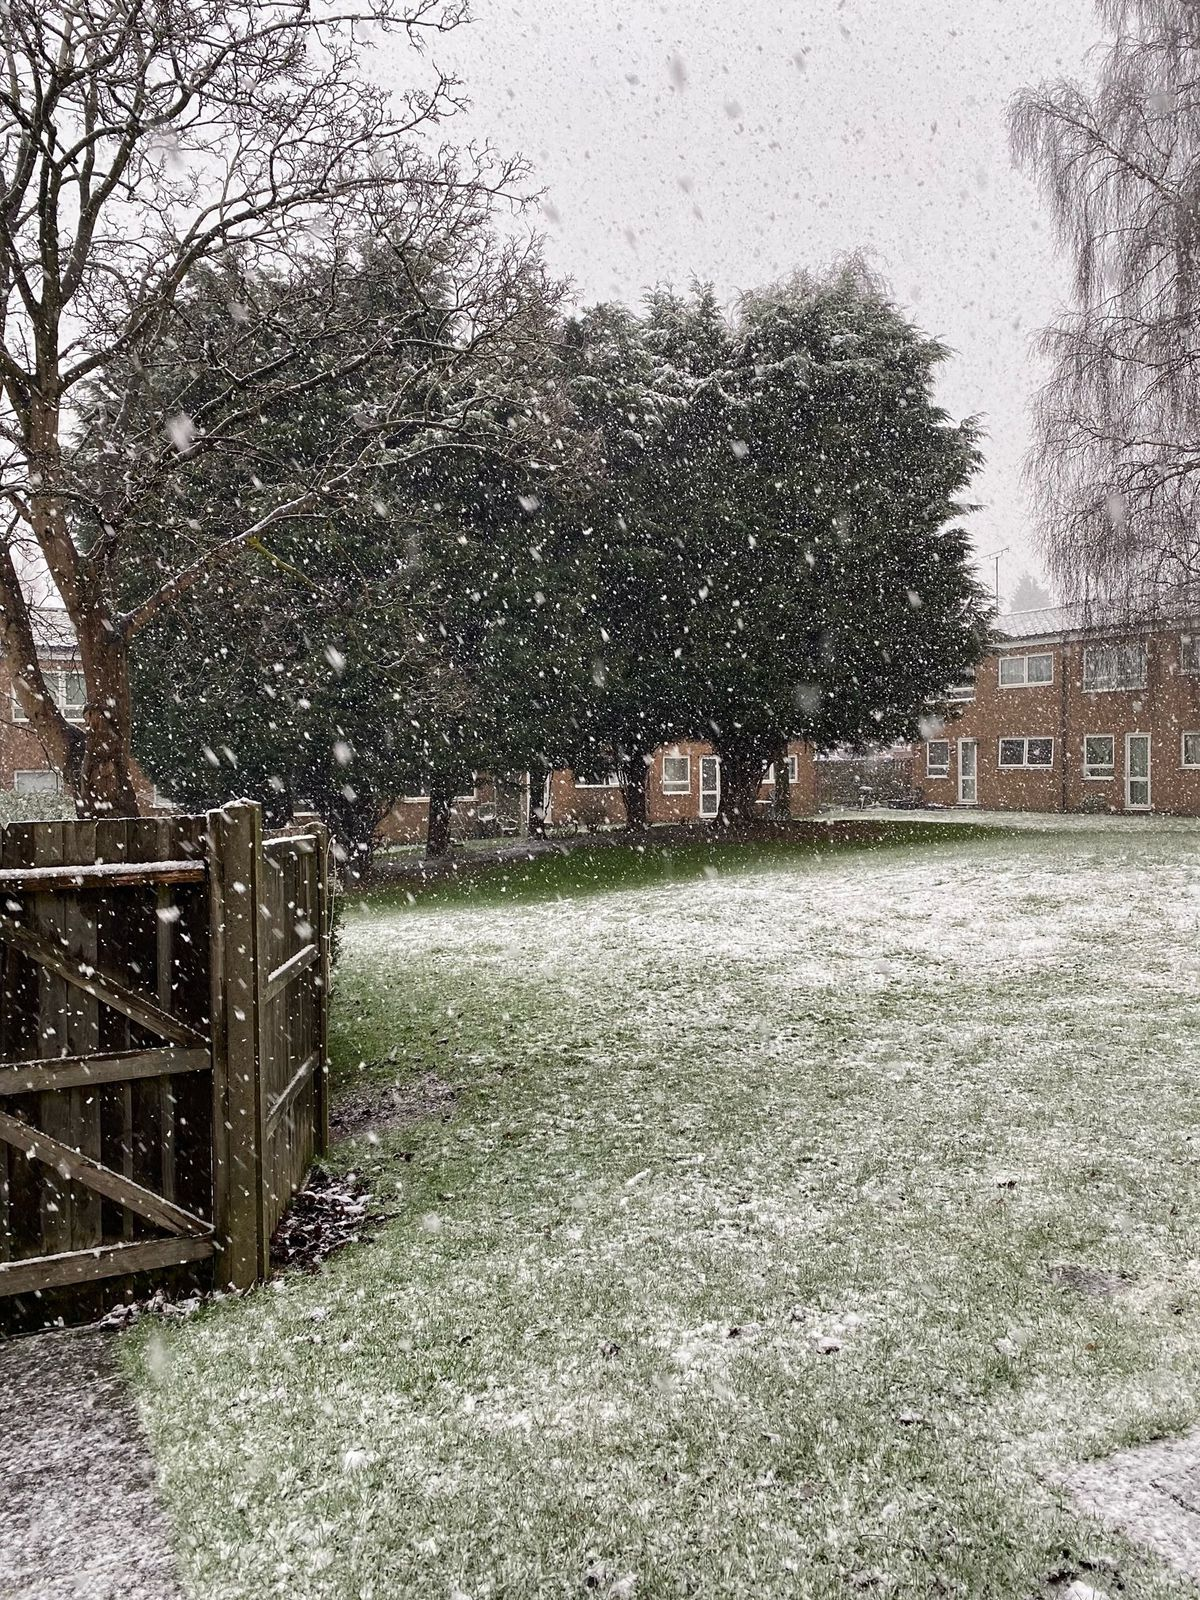 Snow in Trident Drive, Oldbury, by Susan Waldron